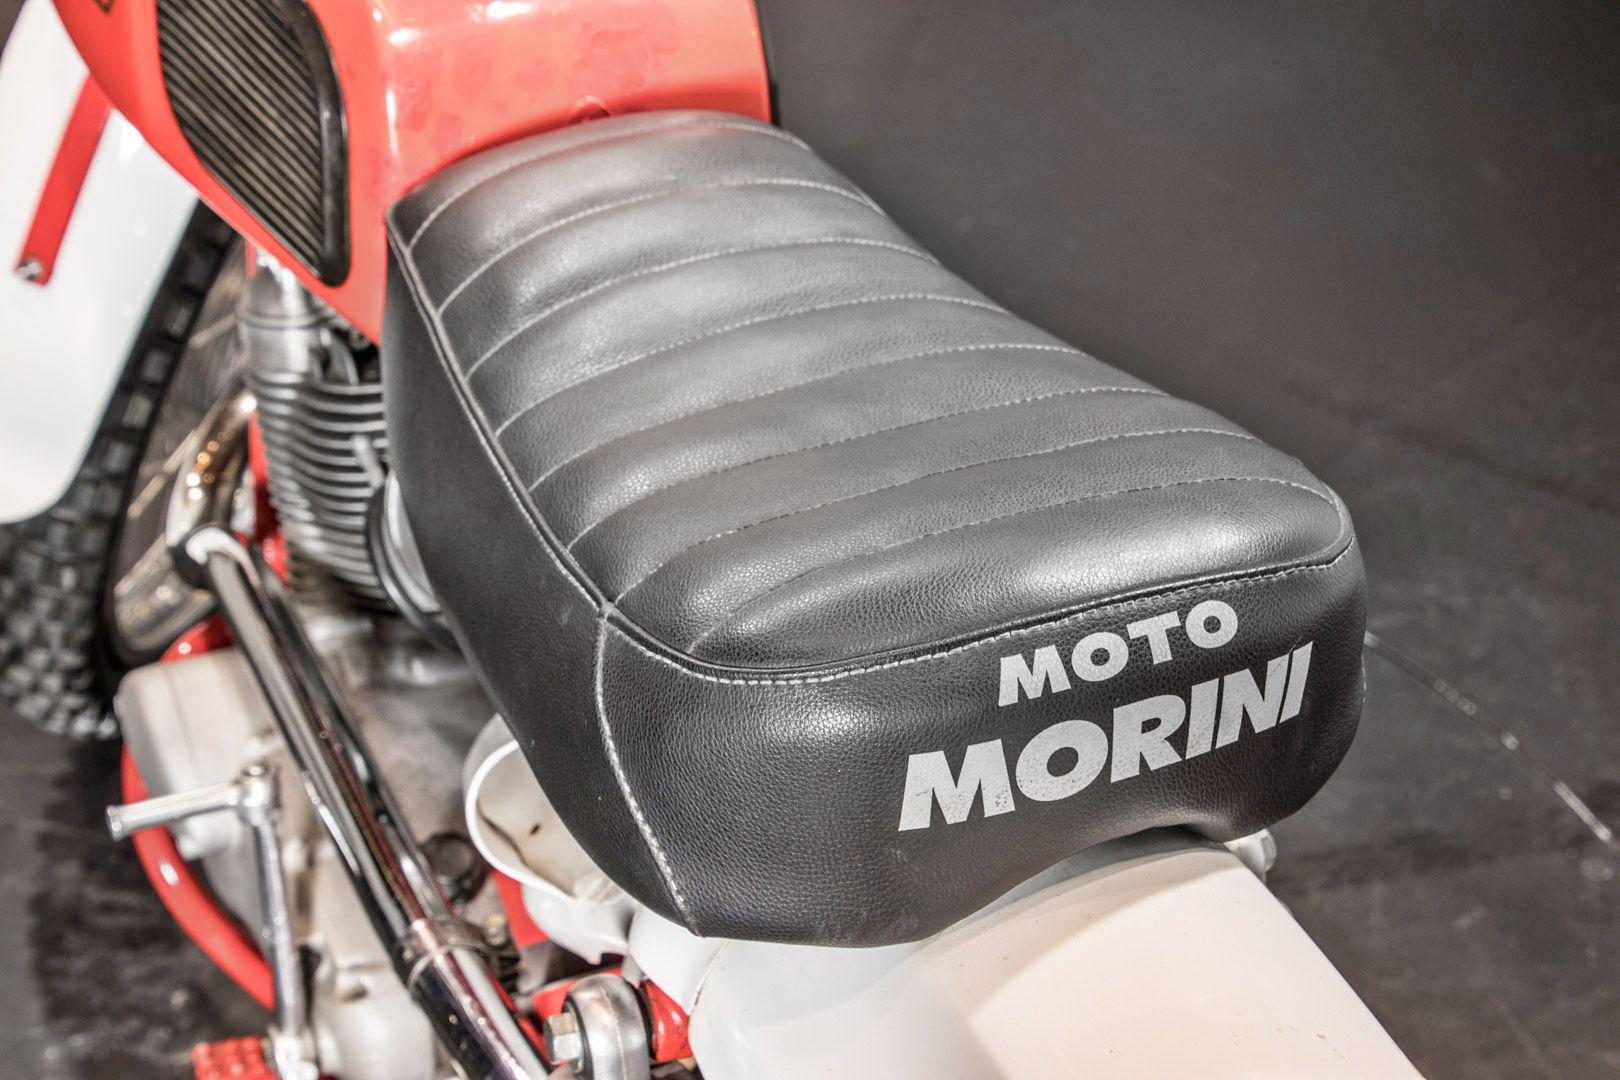 1959 Moto Morini Corsaro 125 37763